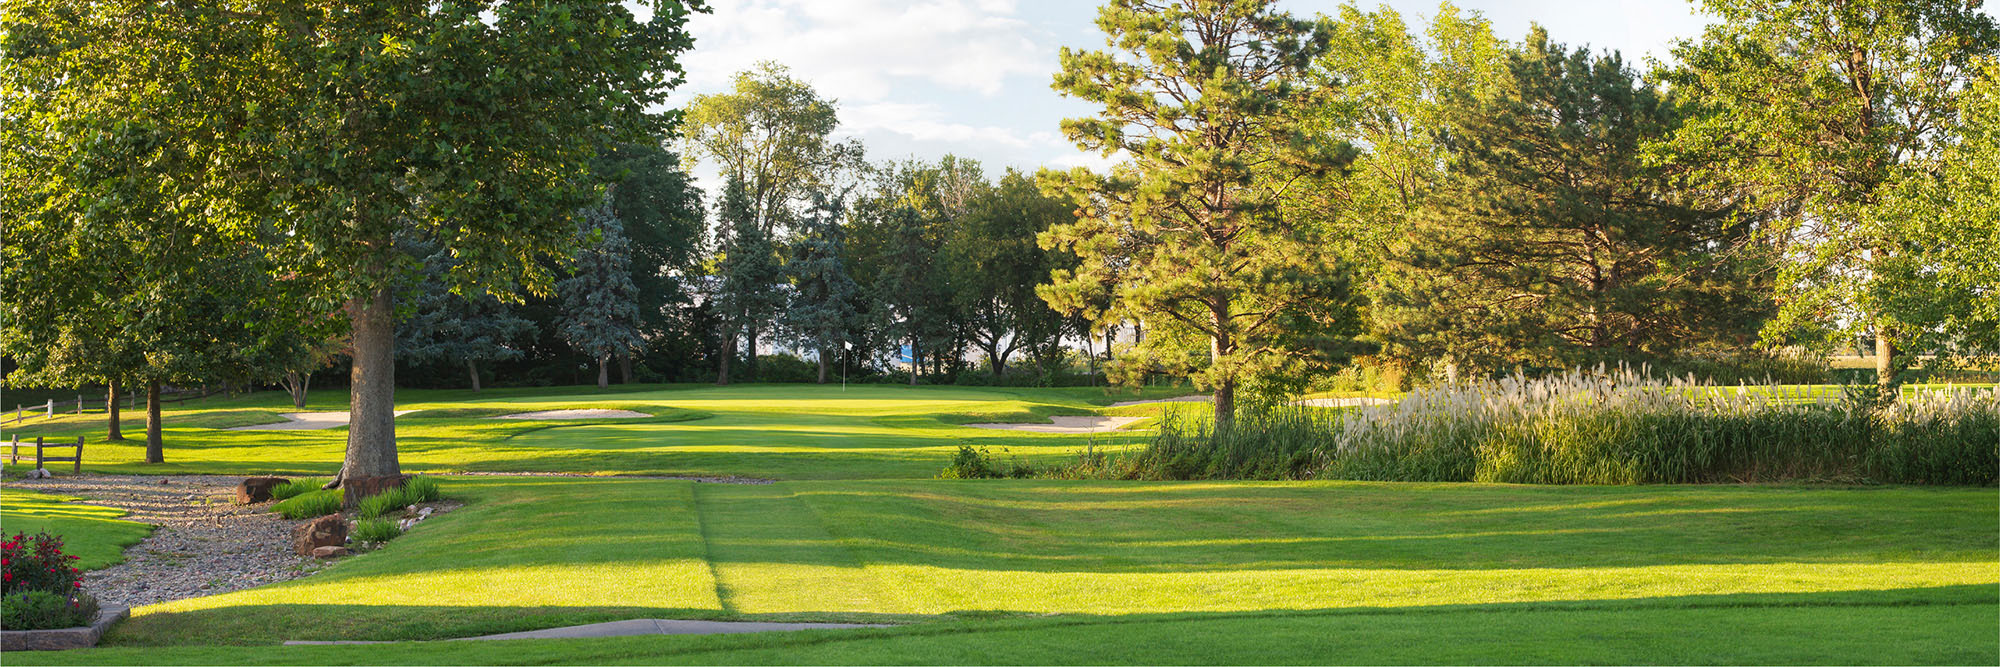 Golf Course Image - Fremont No. 10